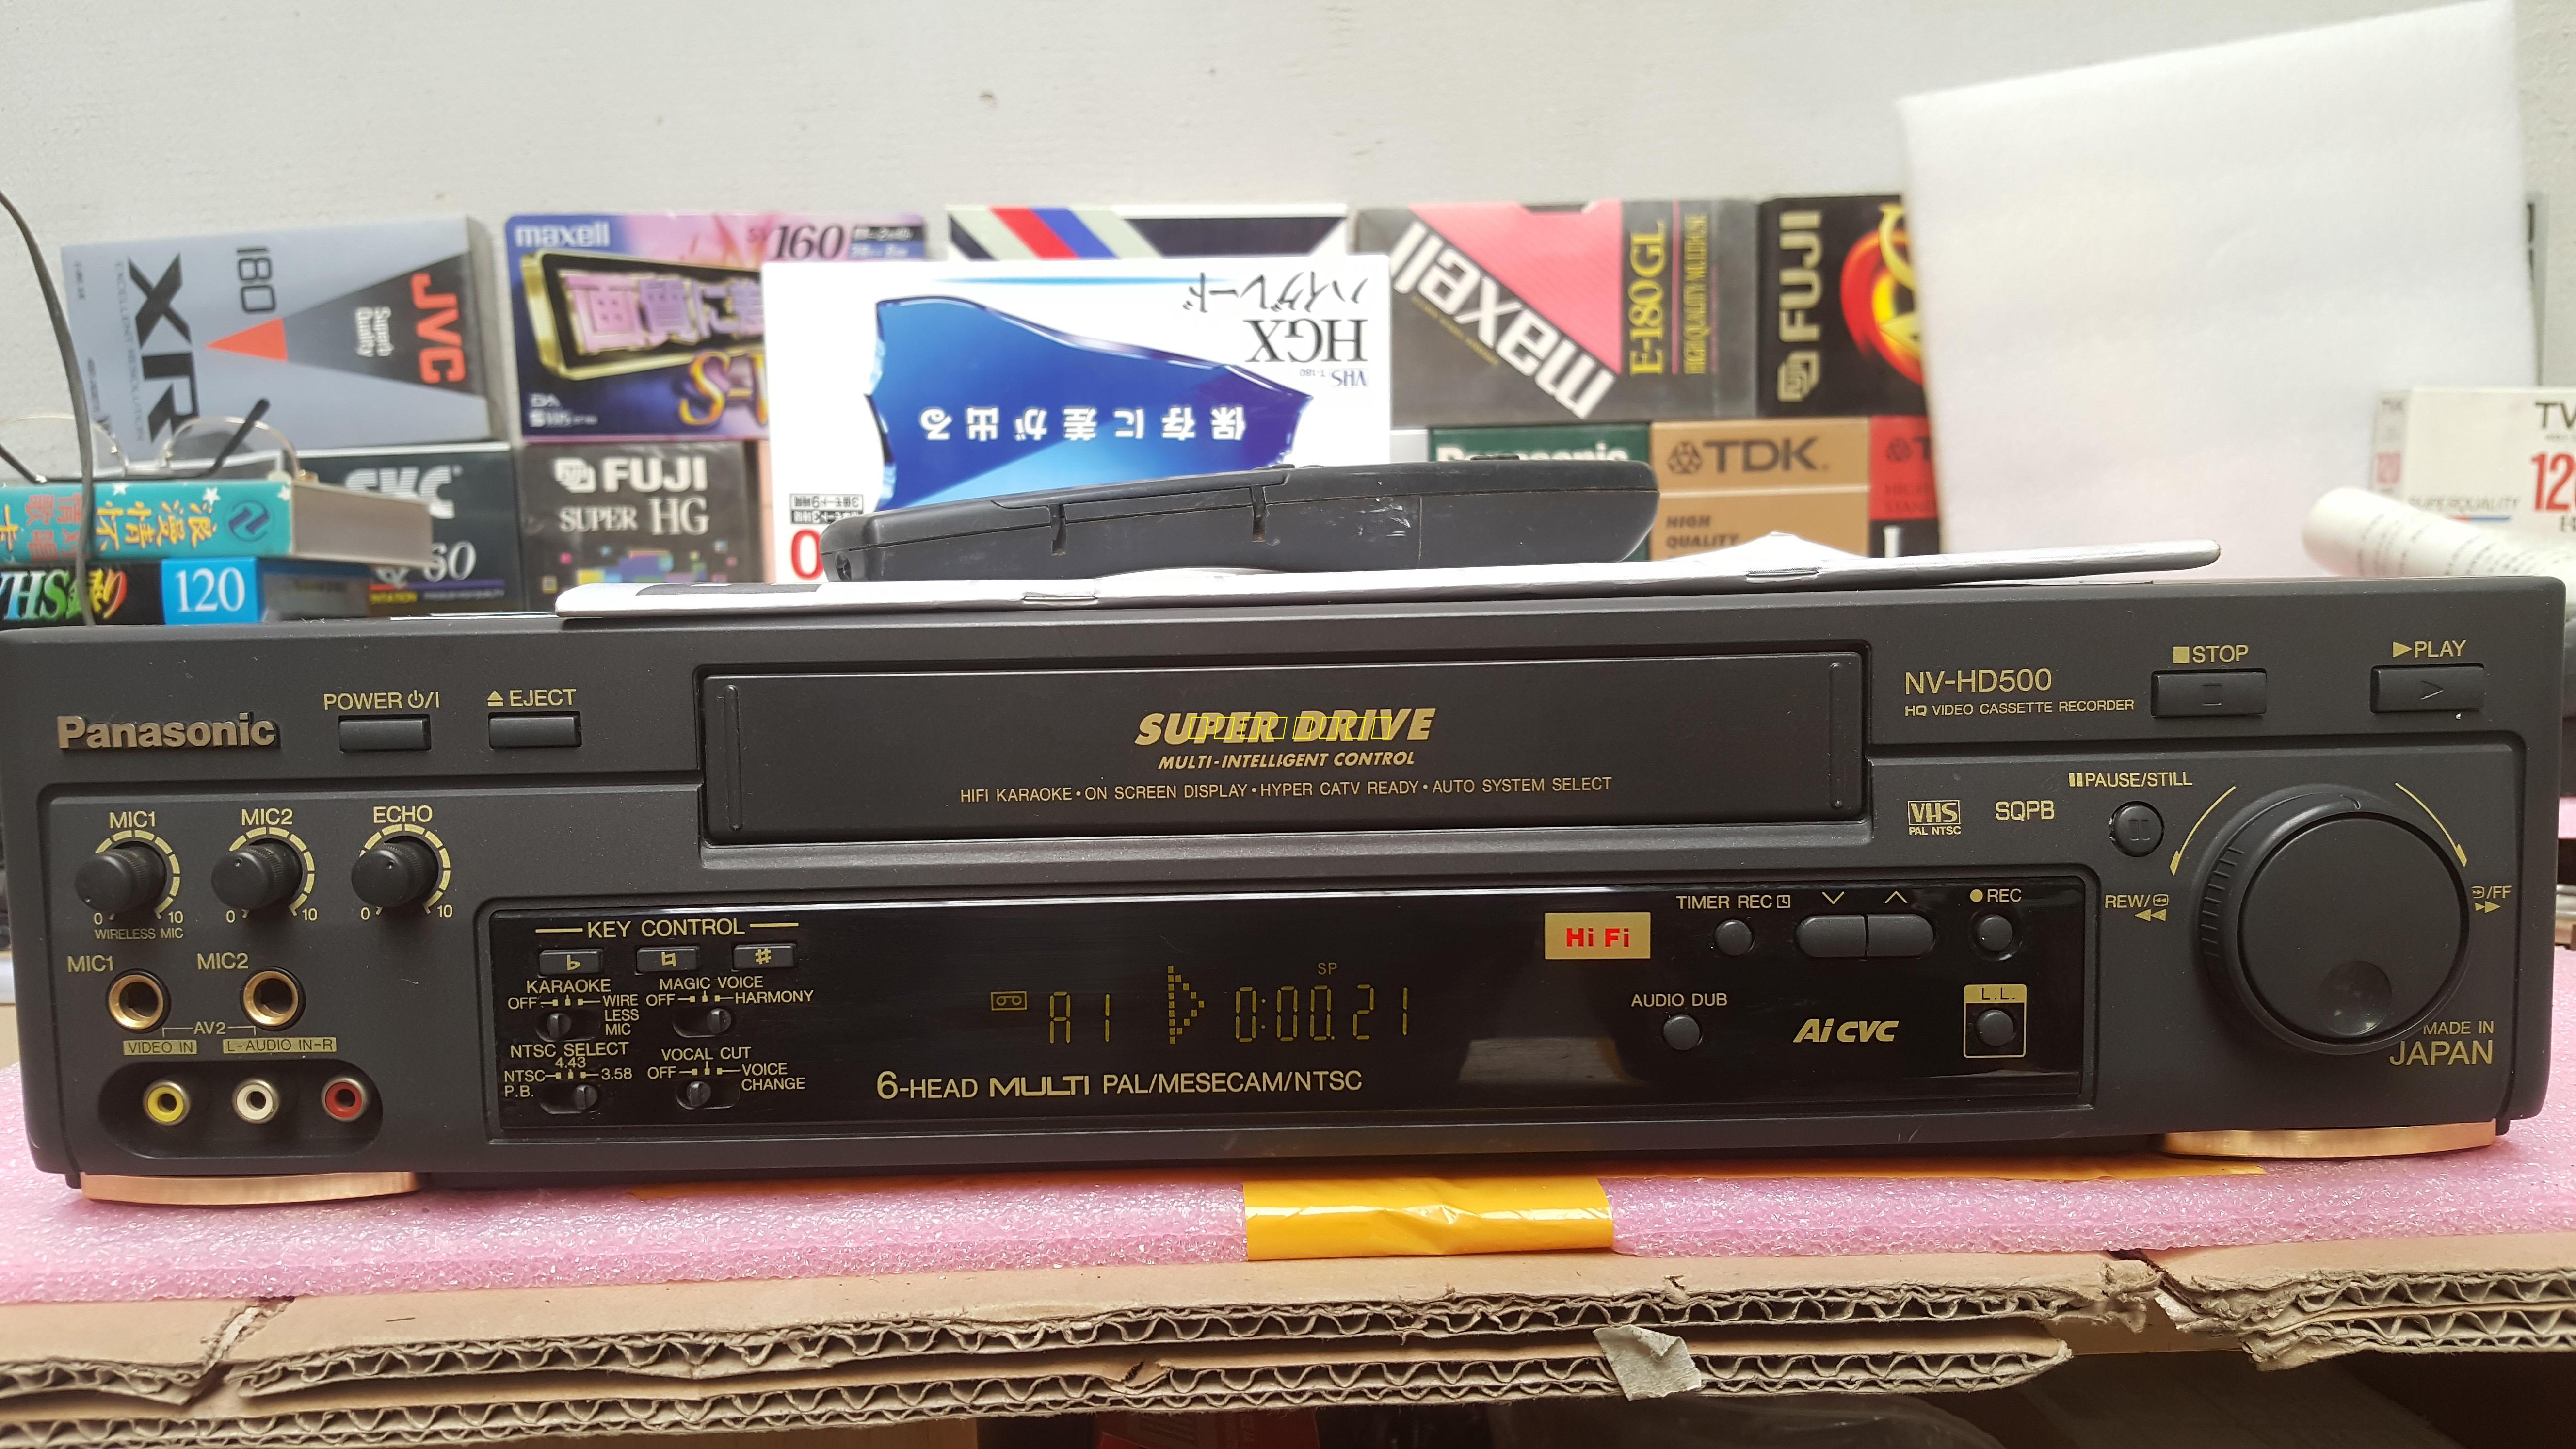 Panasonic/松下VHS磁带录像机NV-HD500MU老录像机9成新